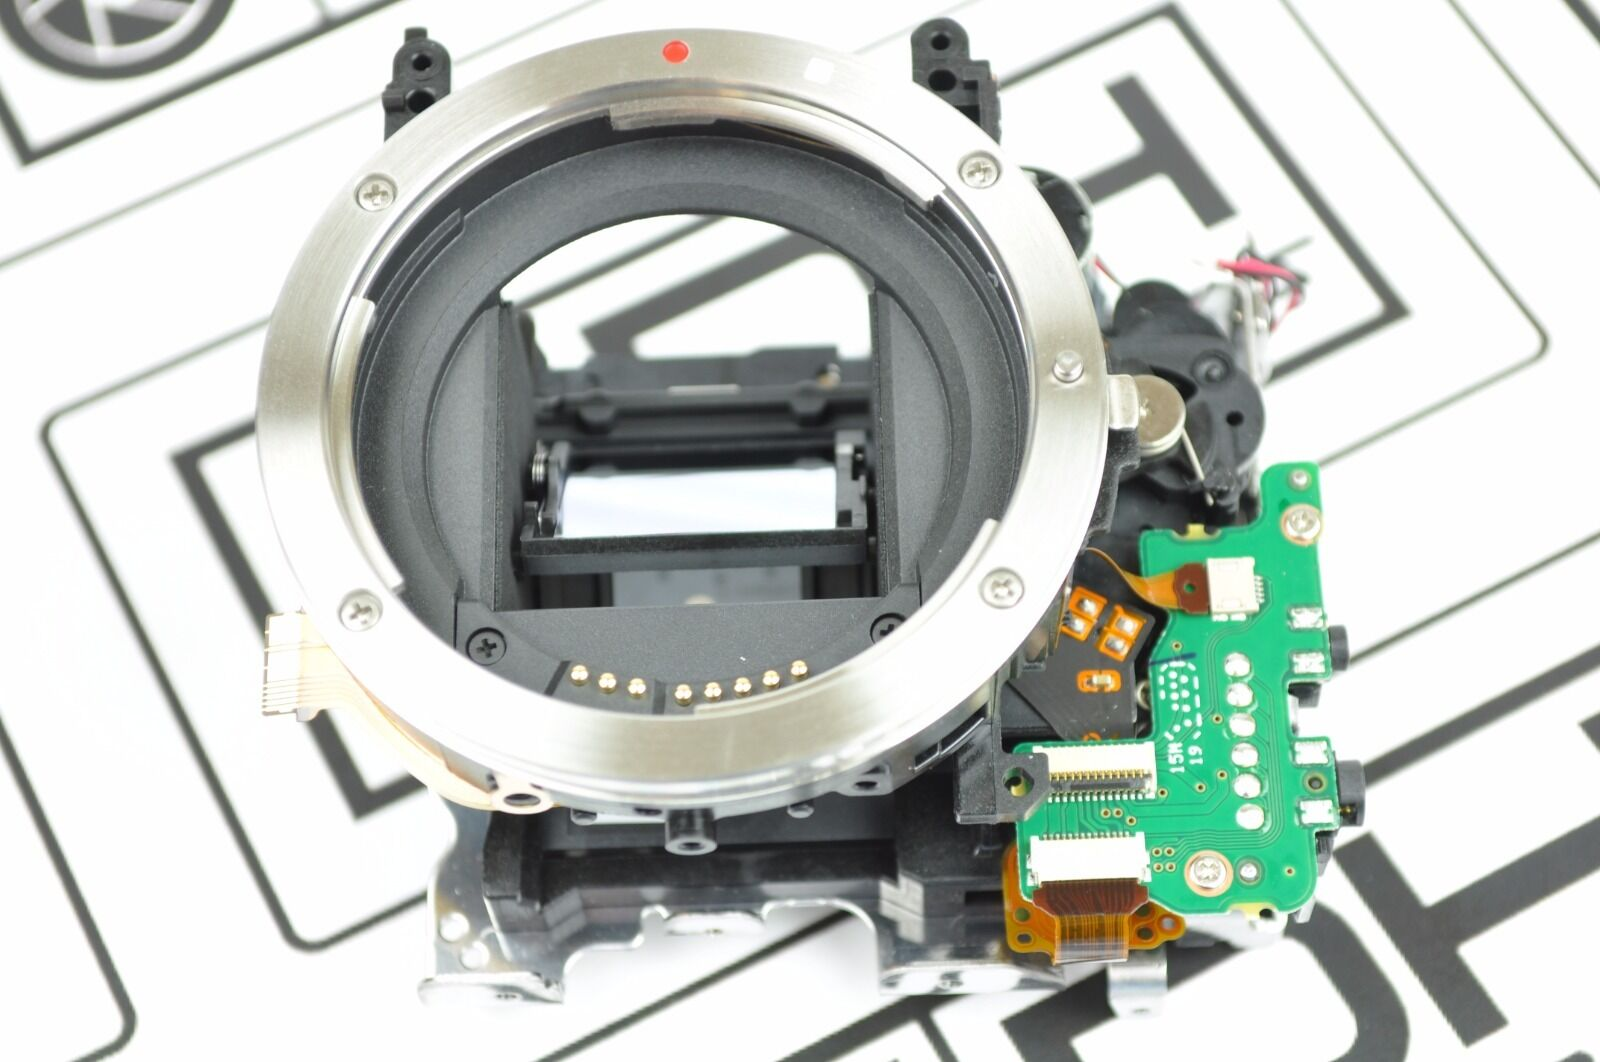 Canon EOS 700D Rebel T5i Mirror Box With Shutter Blade Repla